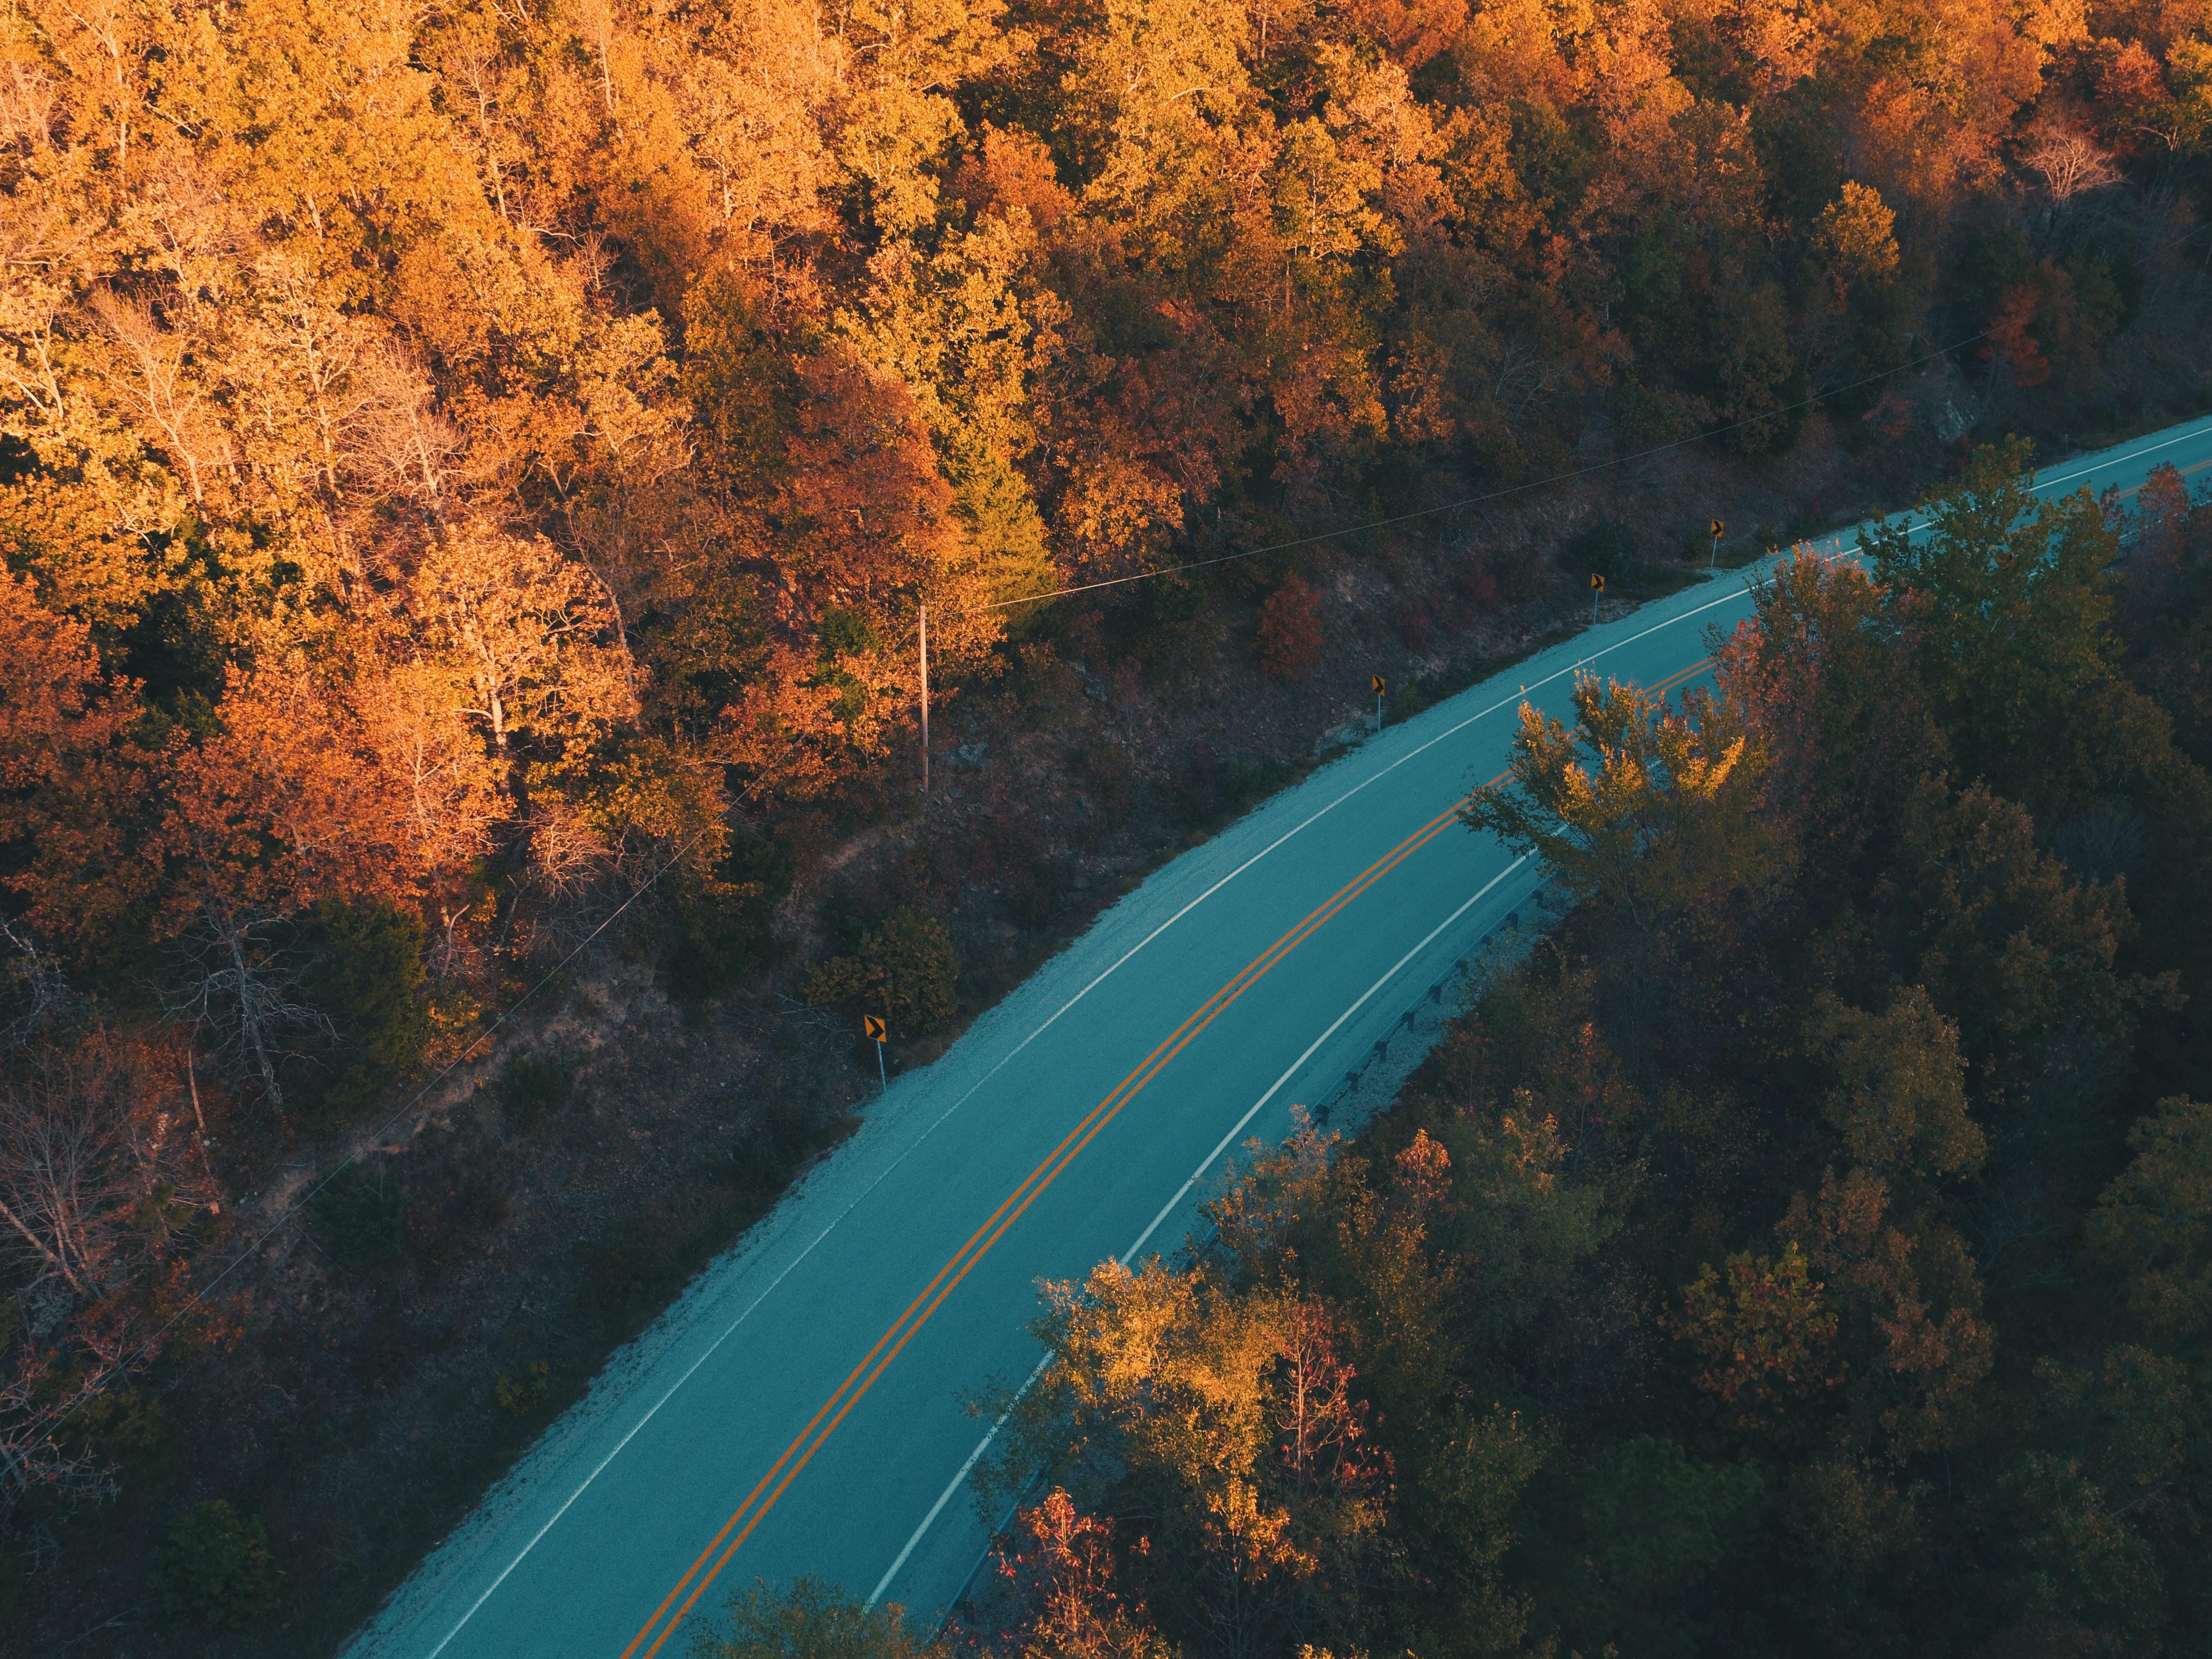 bird's-eye view photography of asphalt road between brown trees